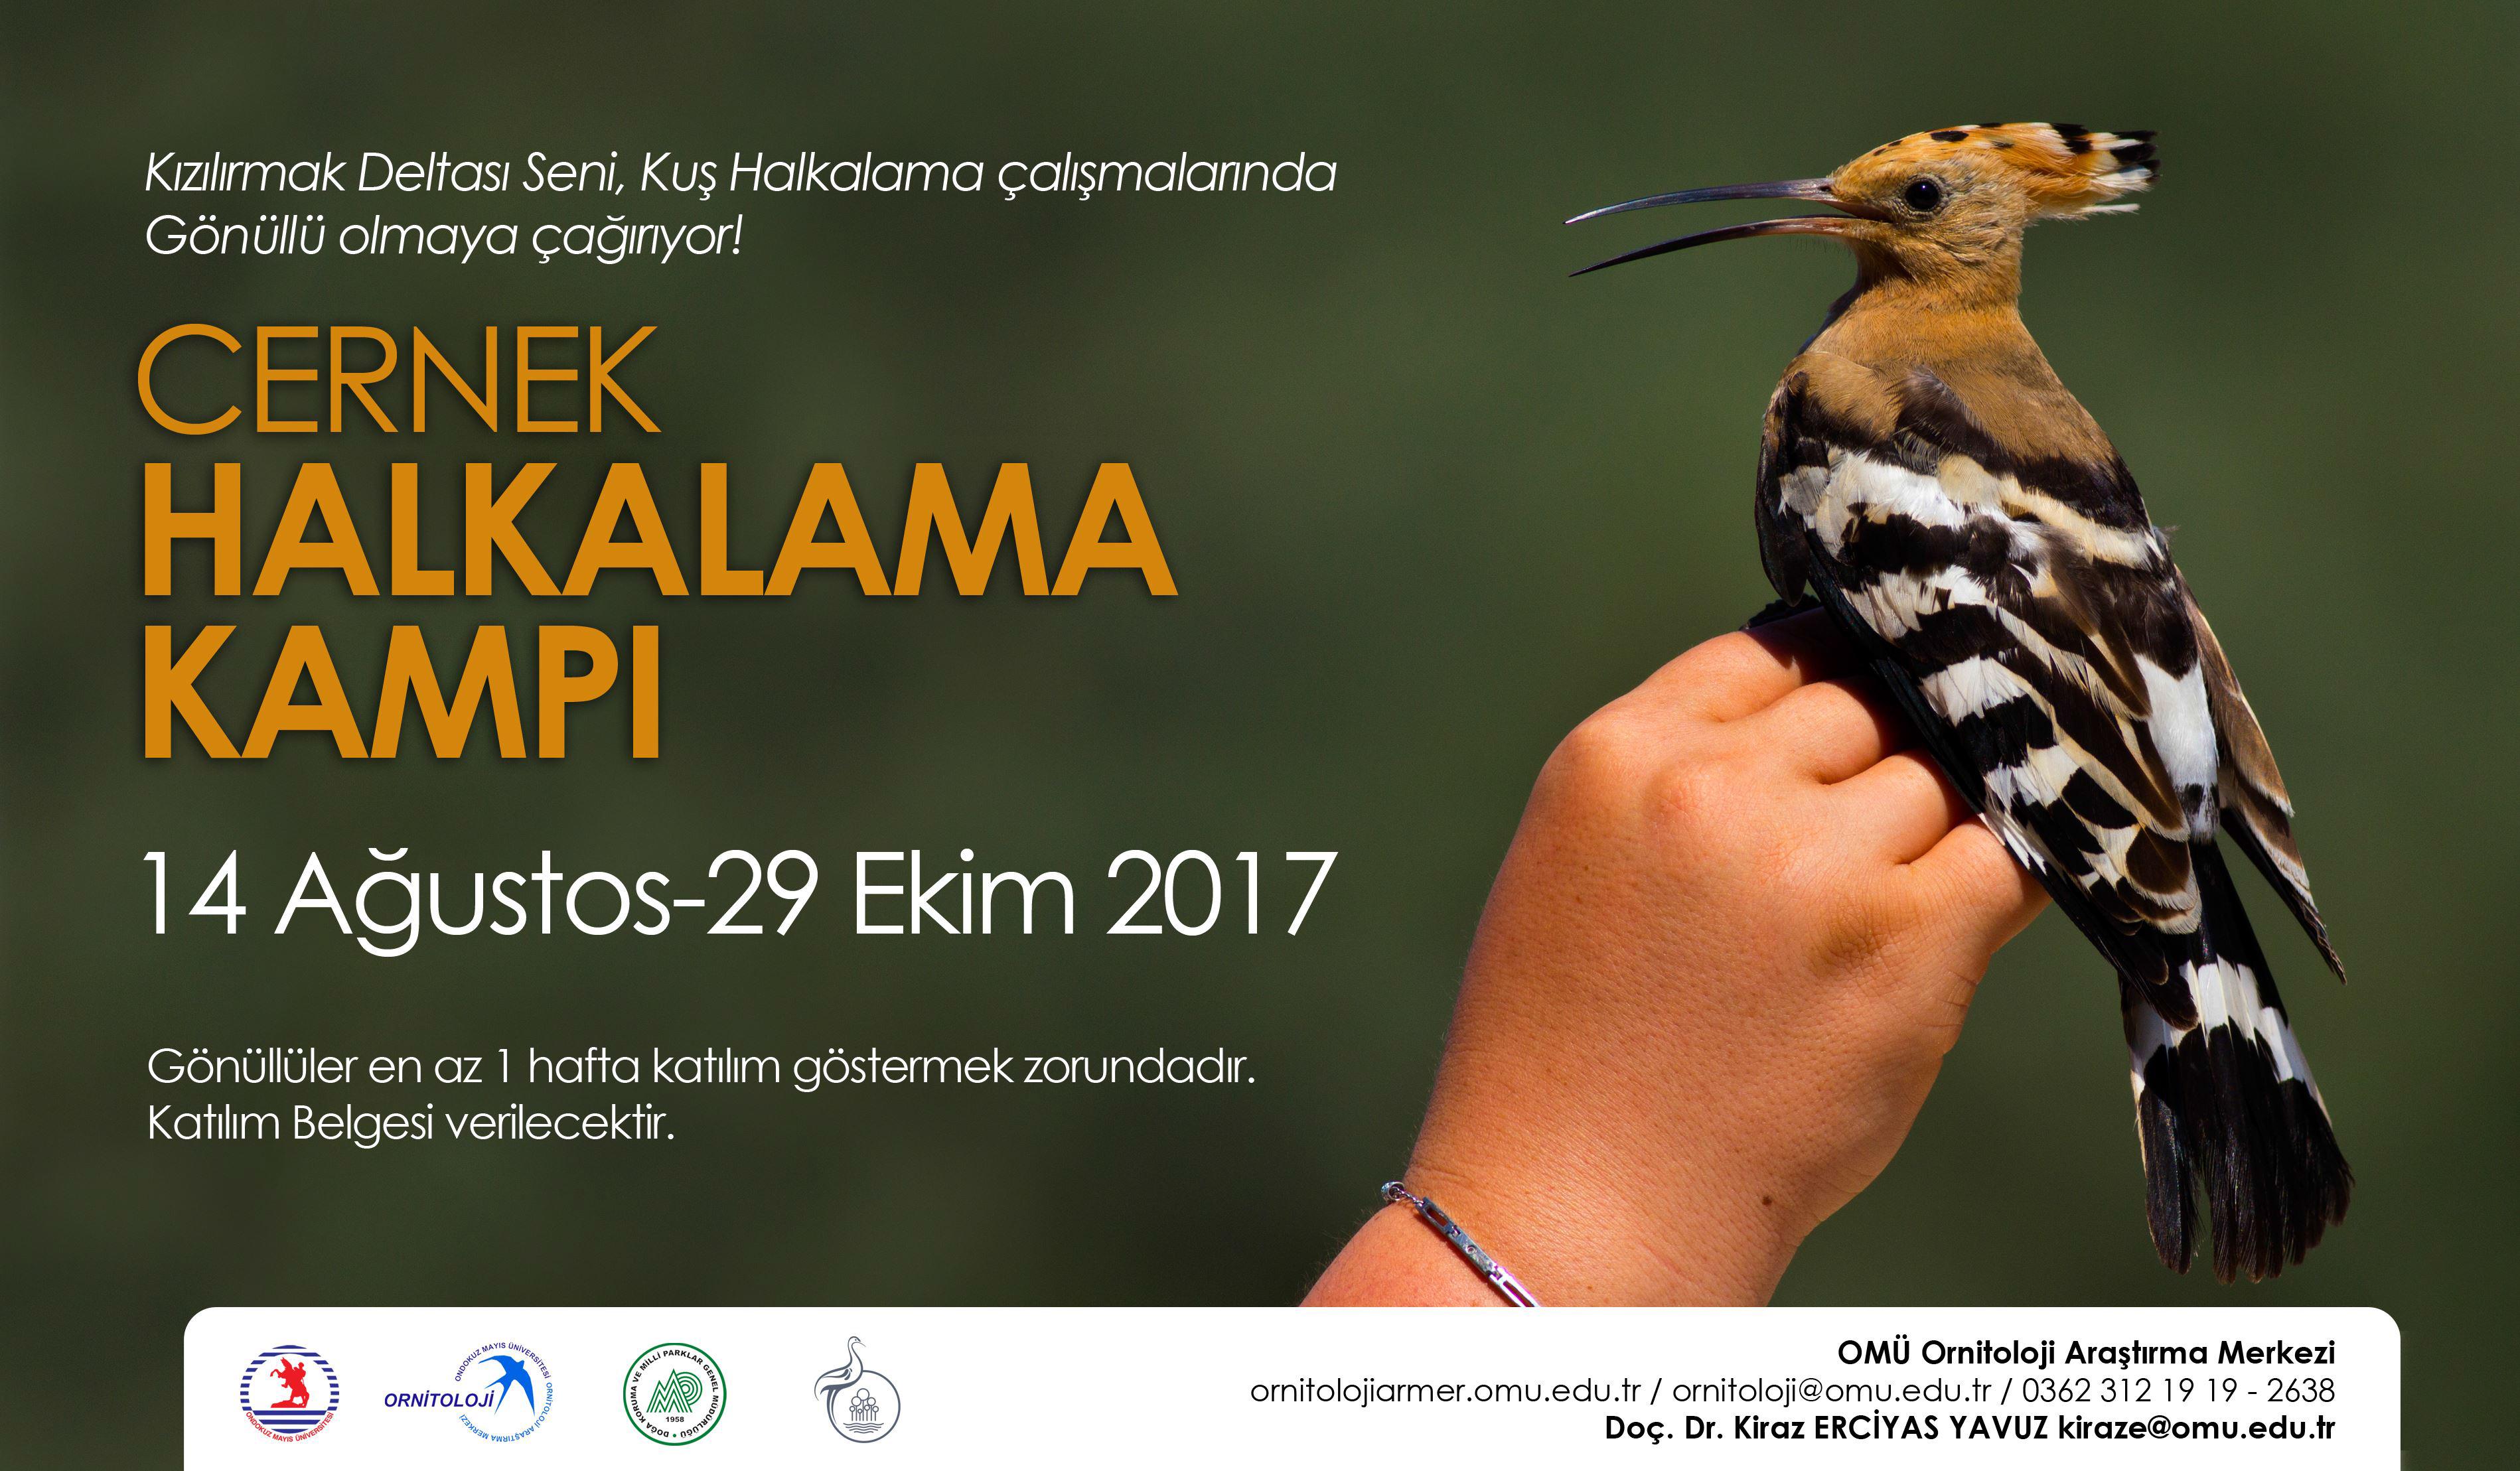 http://www.omu.edu.tr/sites/default/files/files/kizilirmak_deltasi_cernek_kus_halkalama_calismasi/sosyal_2.jpg